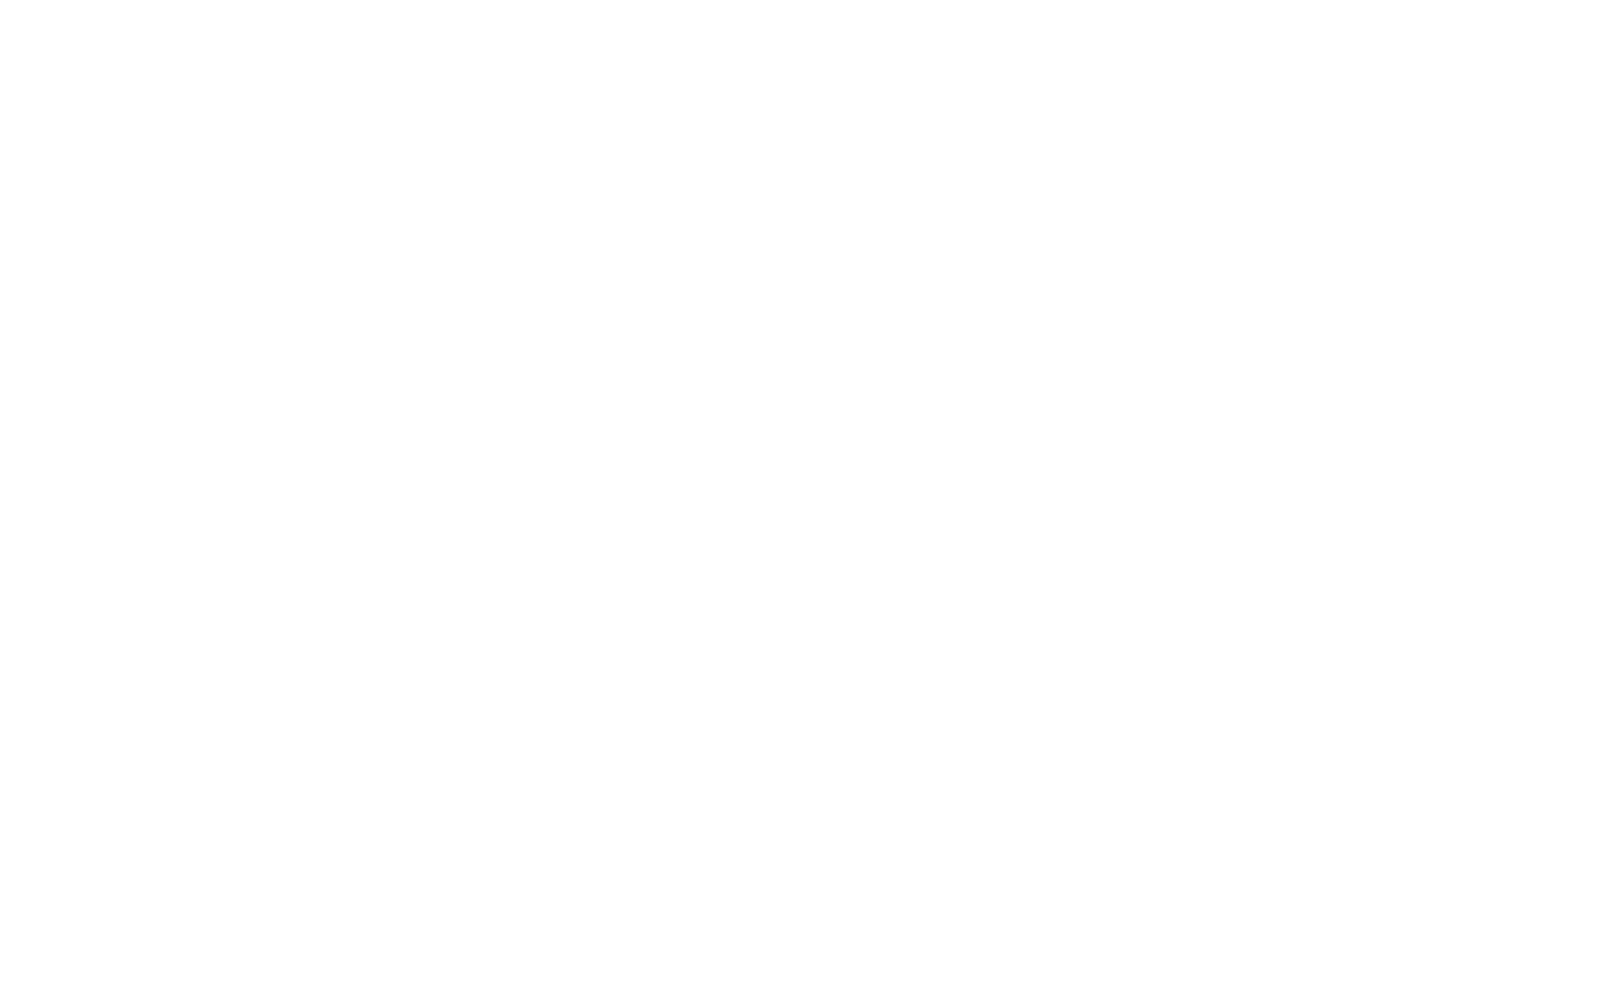 Agromelca. LOBO8XTREM en el Panáfrica 2018